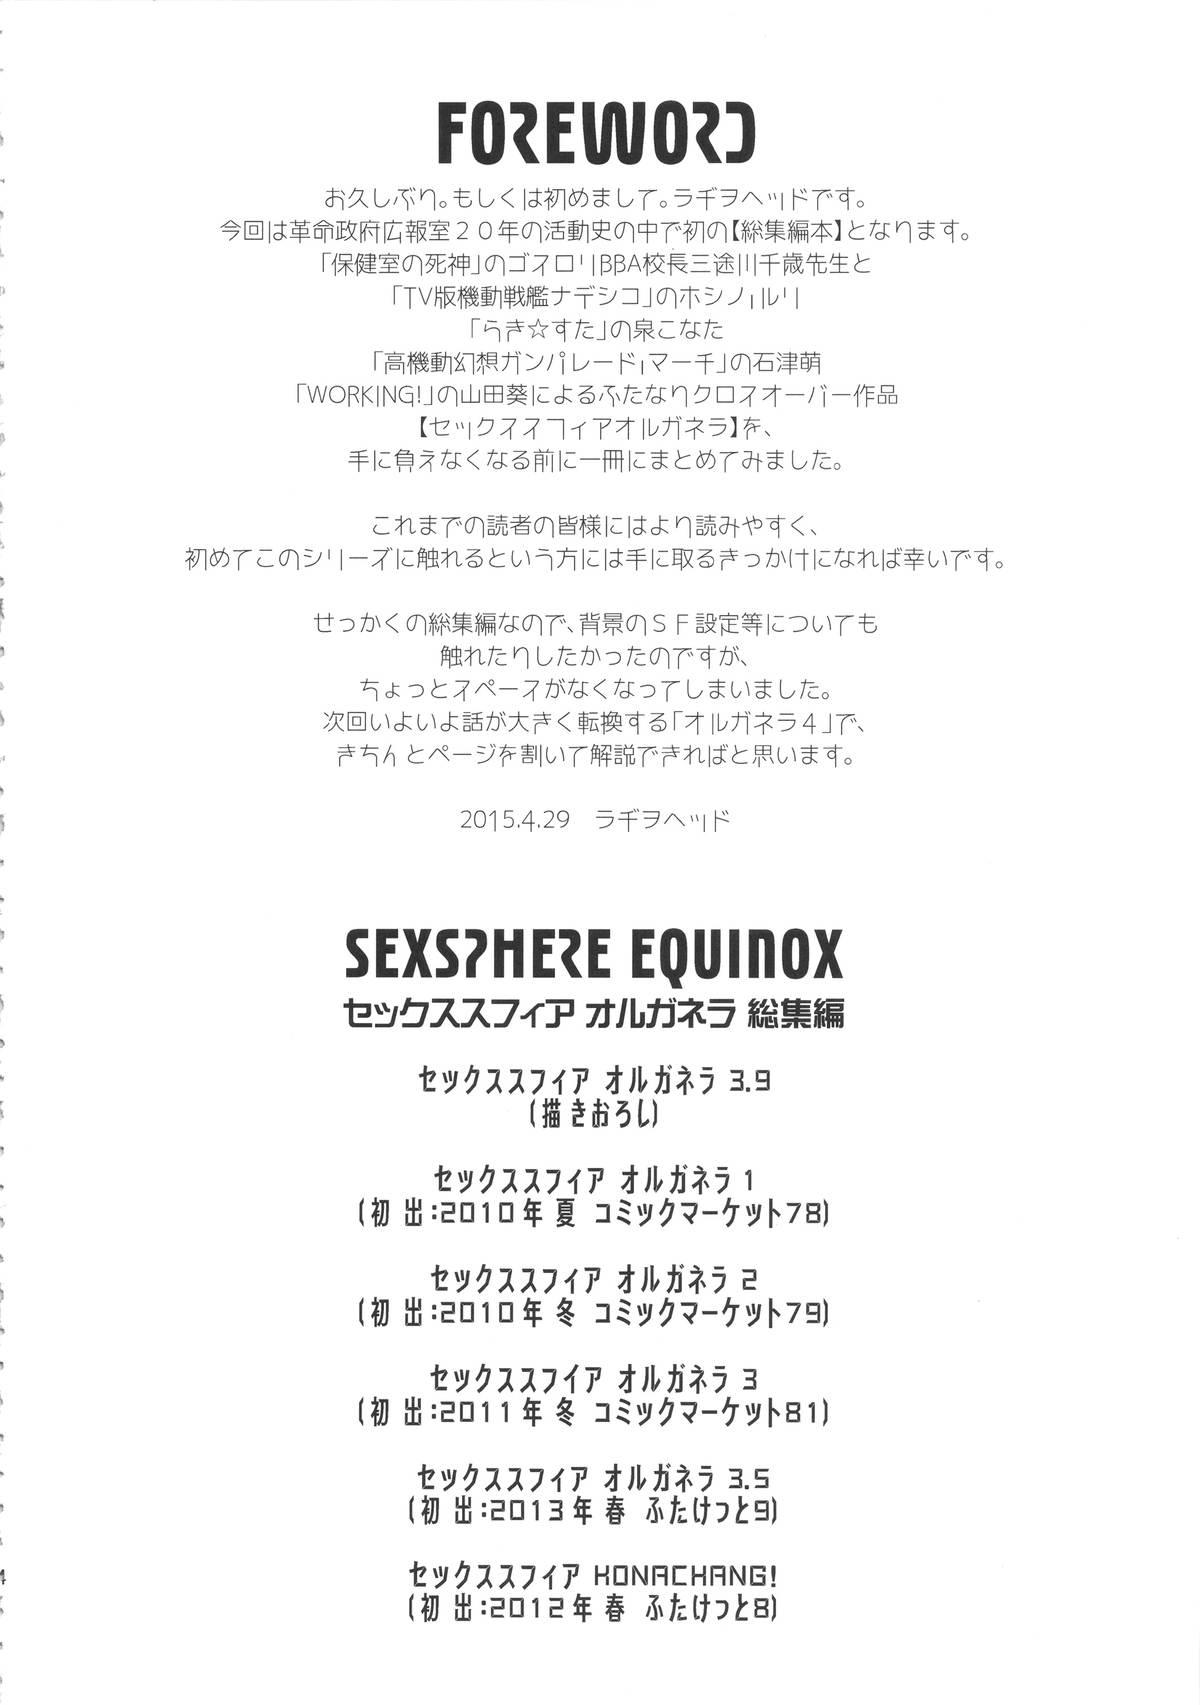 Sex Sphere Equinox 2